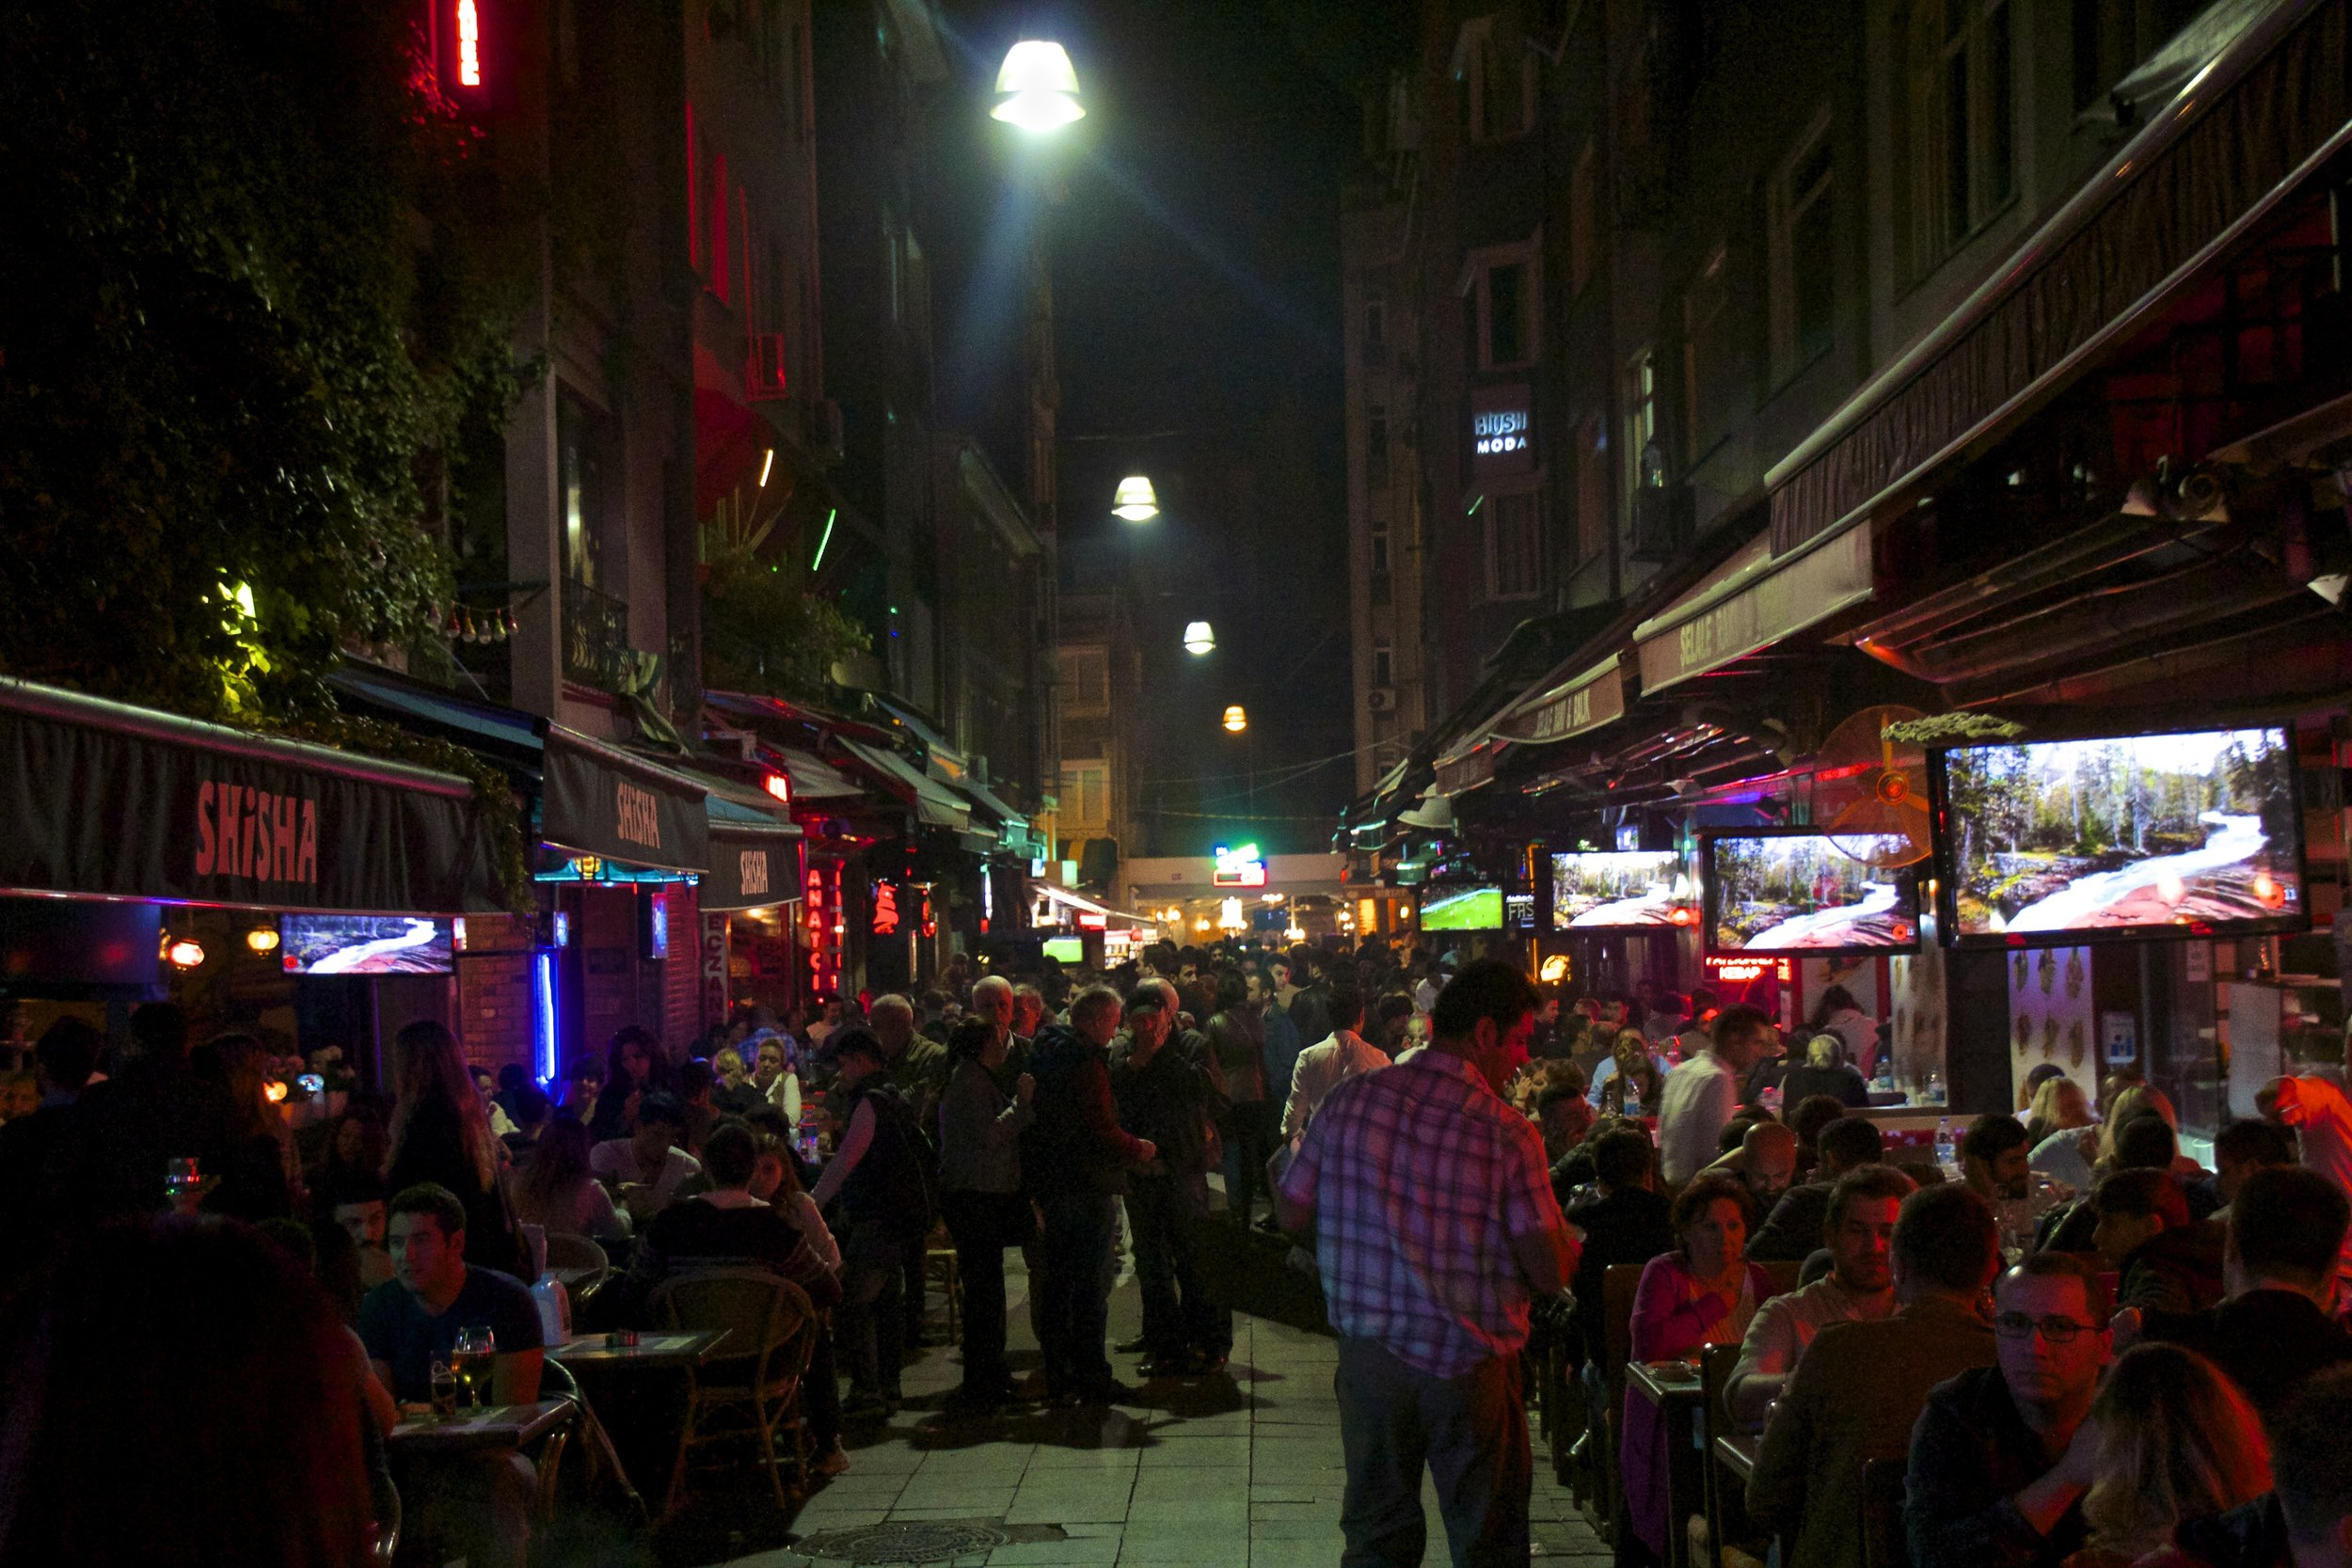 istanbul nightlife turkey 6.jpg